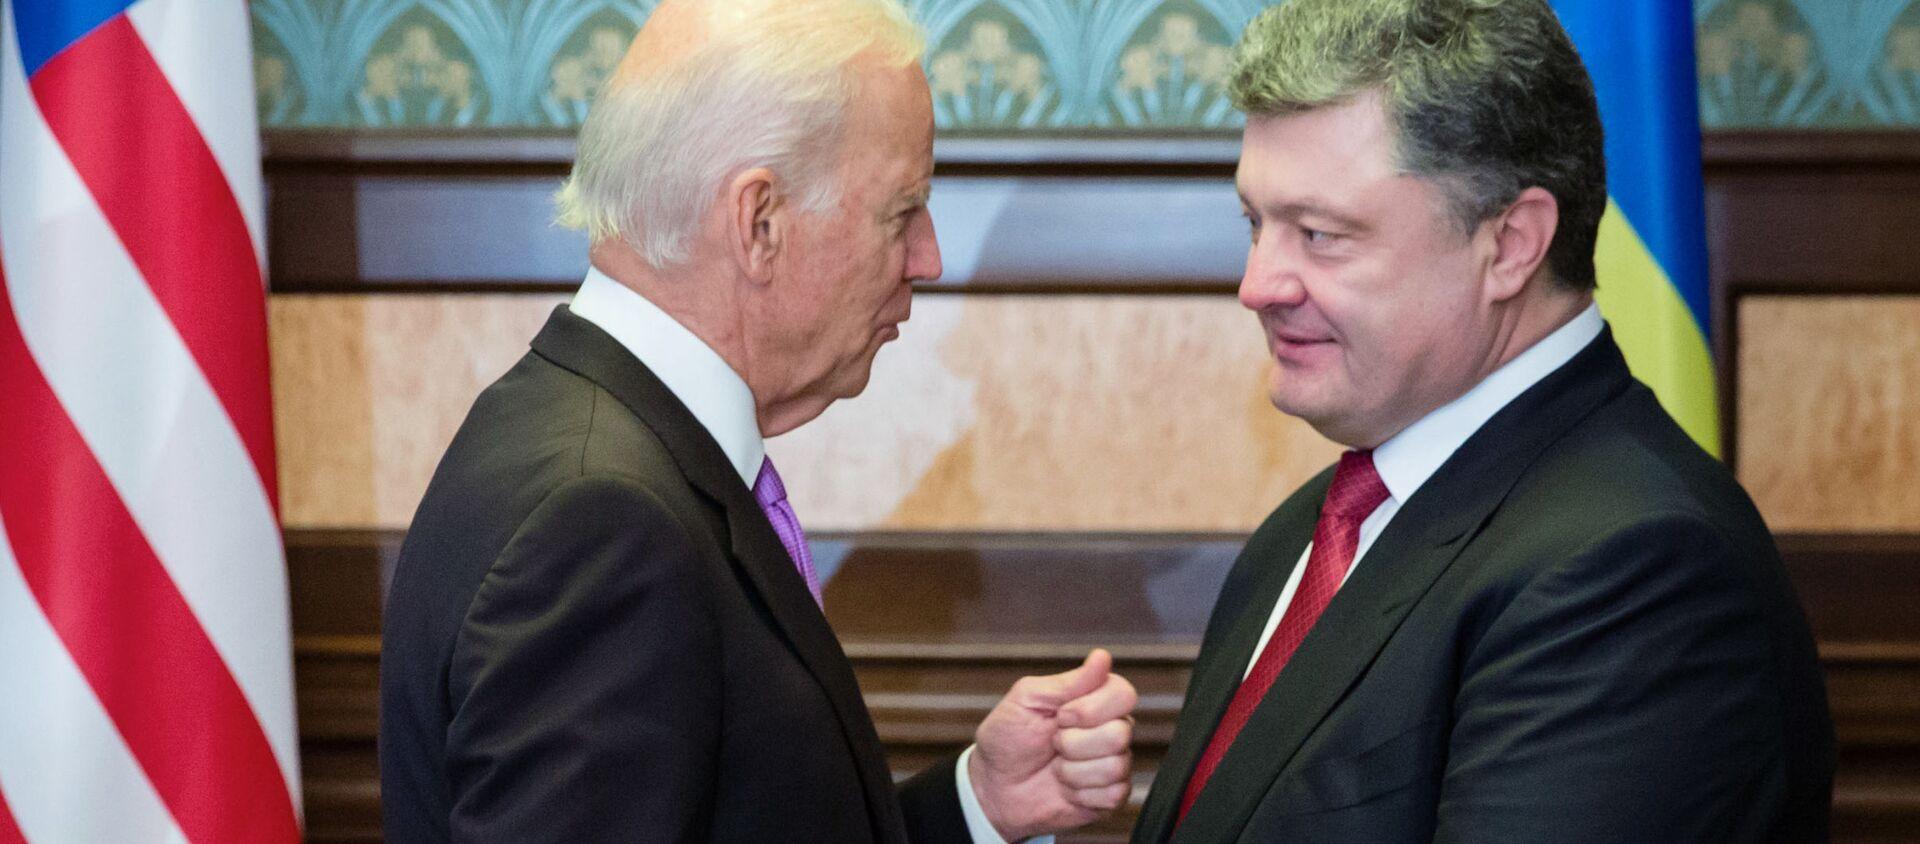 US Vice President Joe Biden (left) and Ukrainian President Petro Poroshenko during a meeting in Kiev - Sputnik International, 1920, 17.08.2020